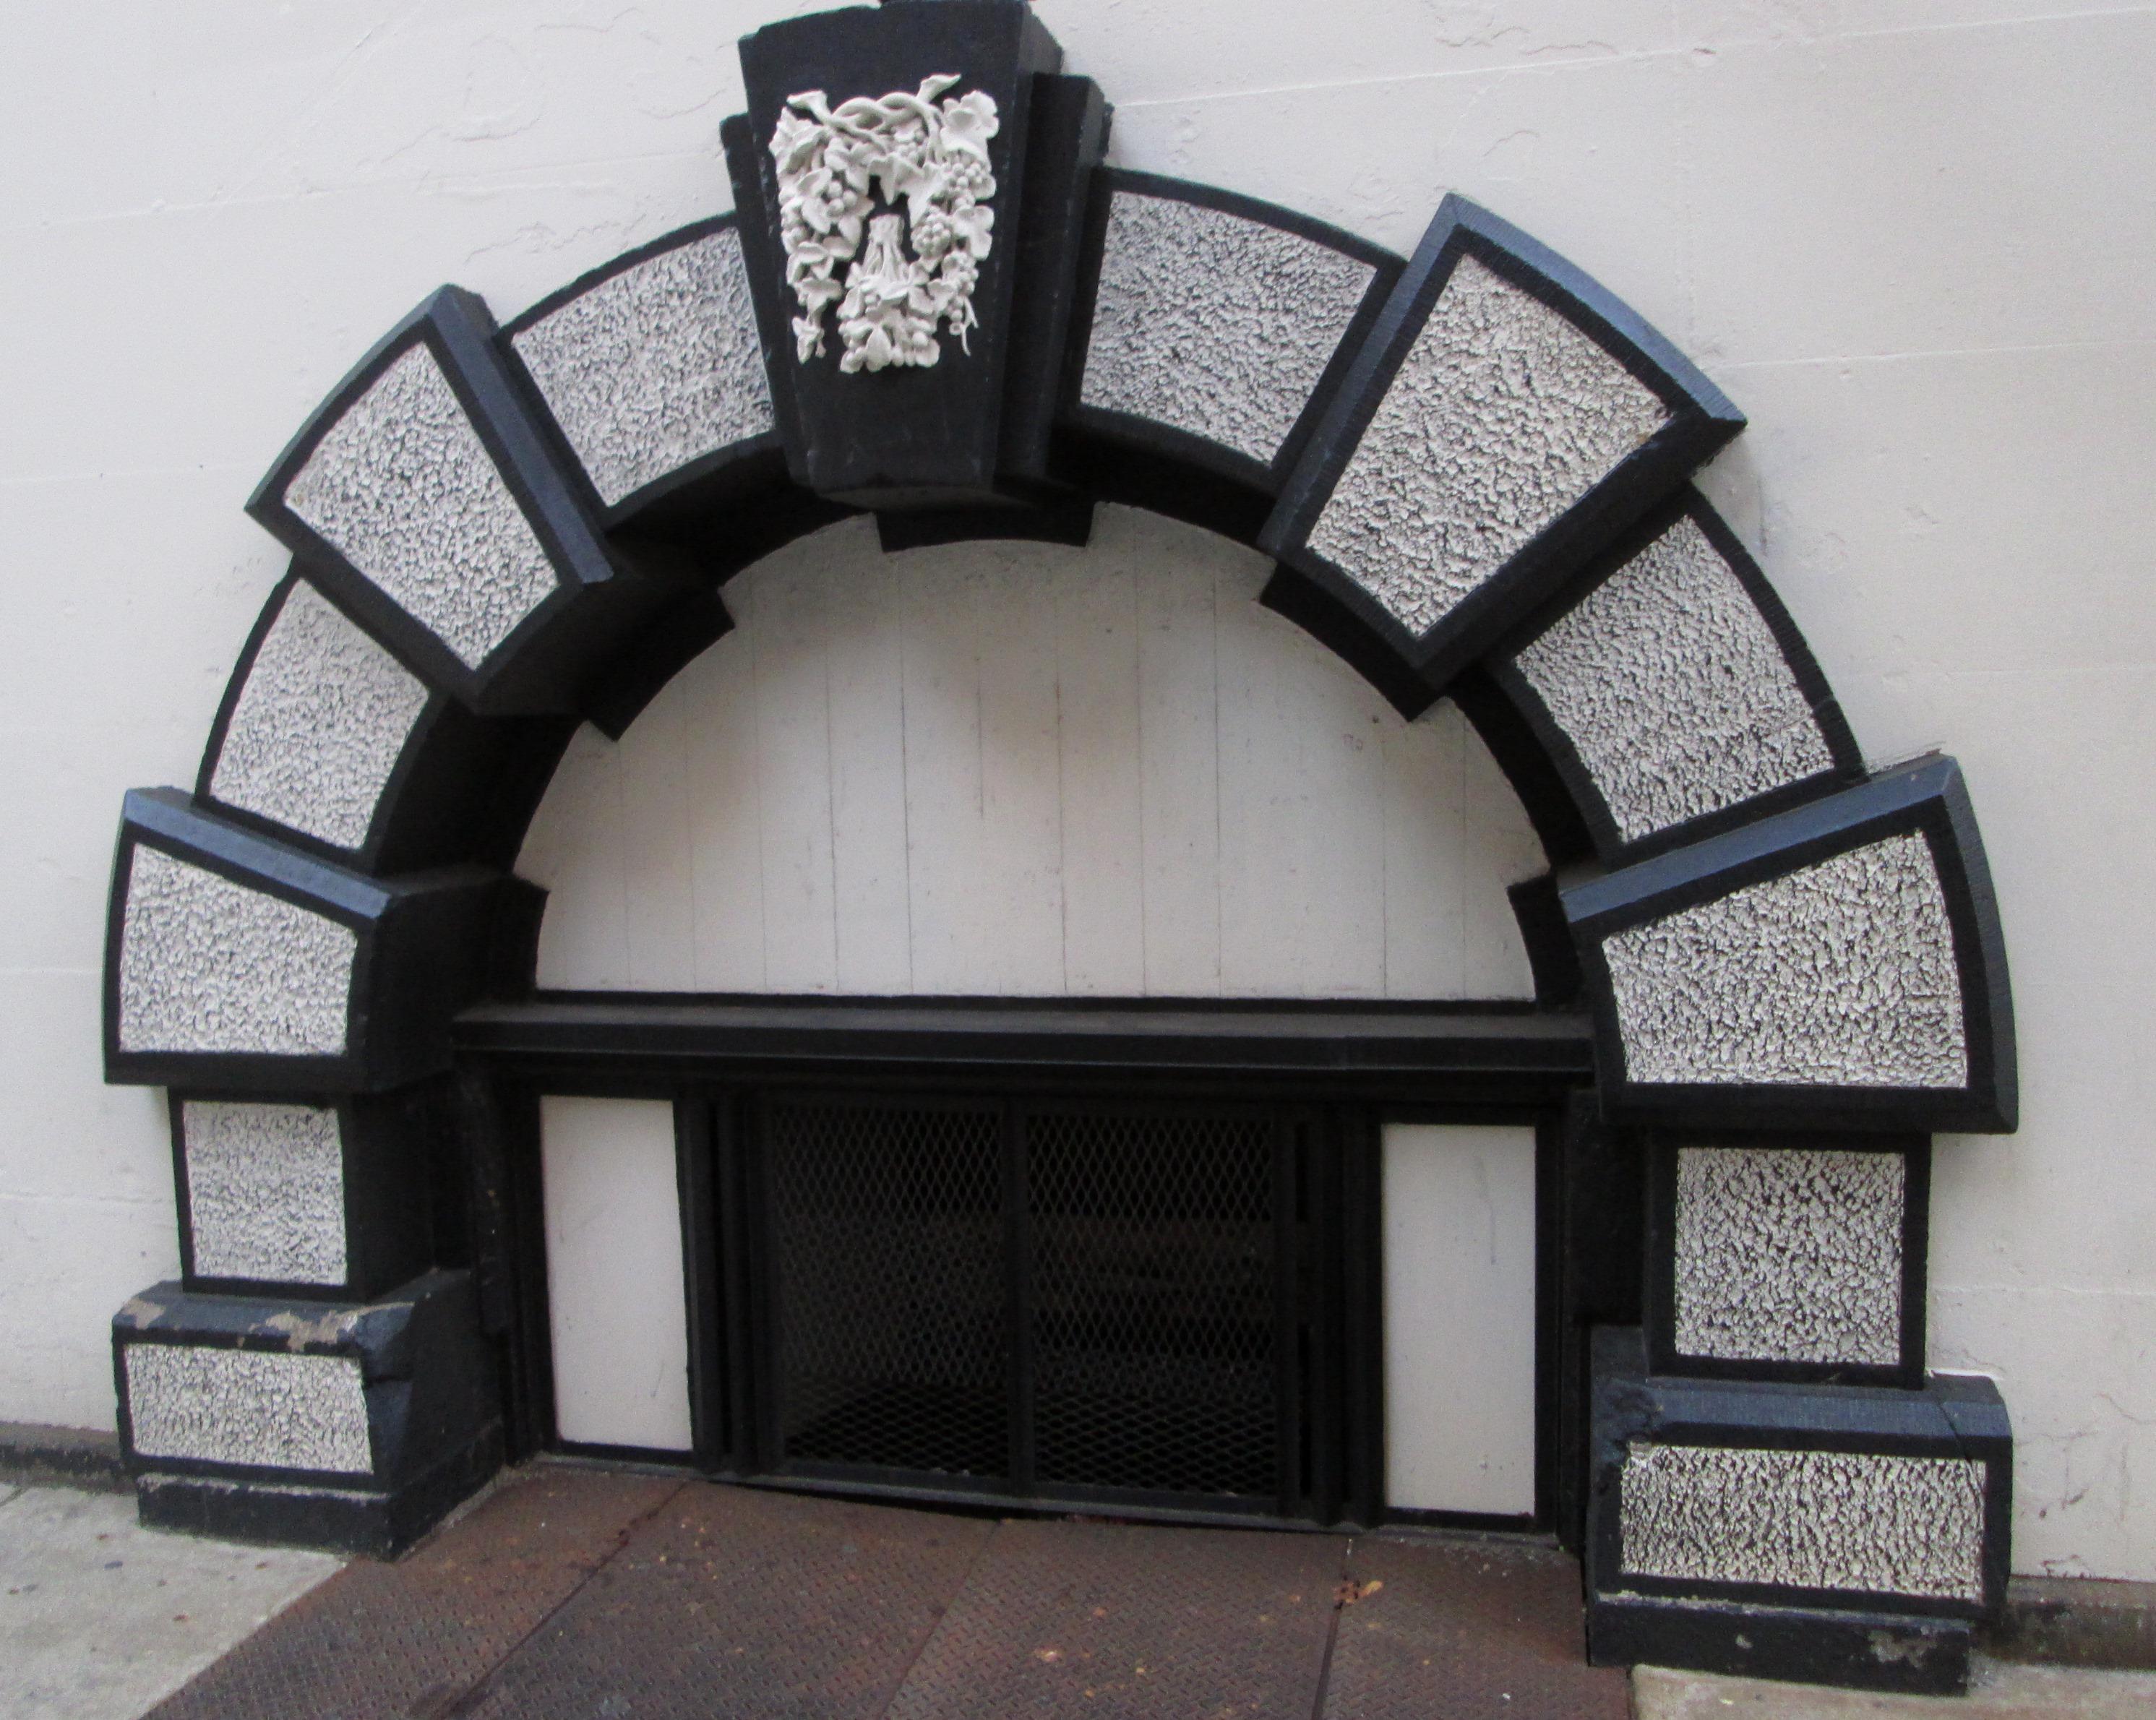 File701 Chestnut Street arch over sidewalk doors.jpg & File:701 Chestnut Street arch over sidewalk doors.jpg - Wikimedia ... pezcame.com